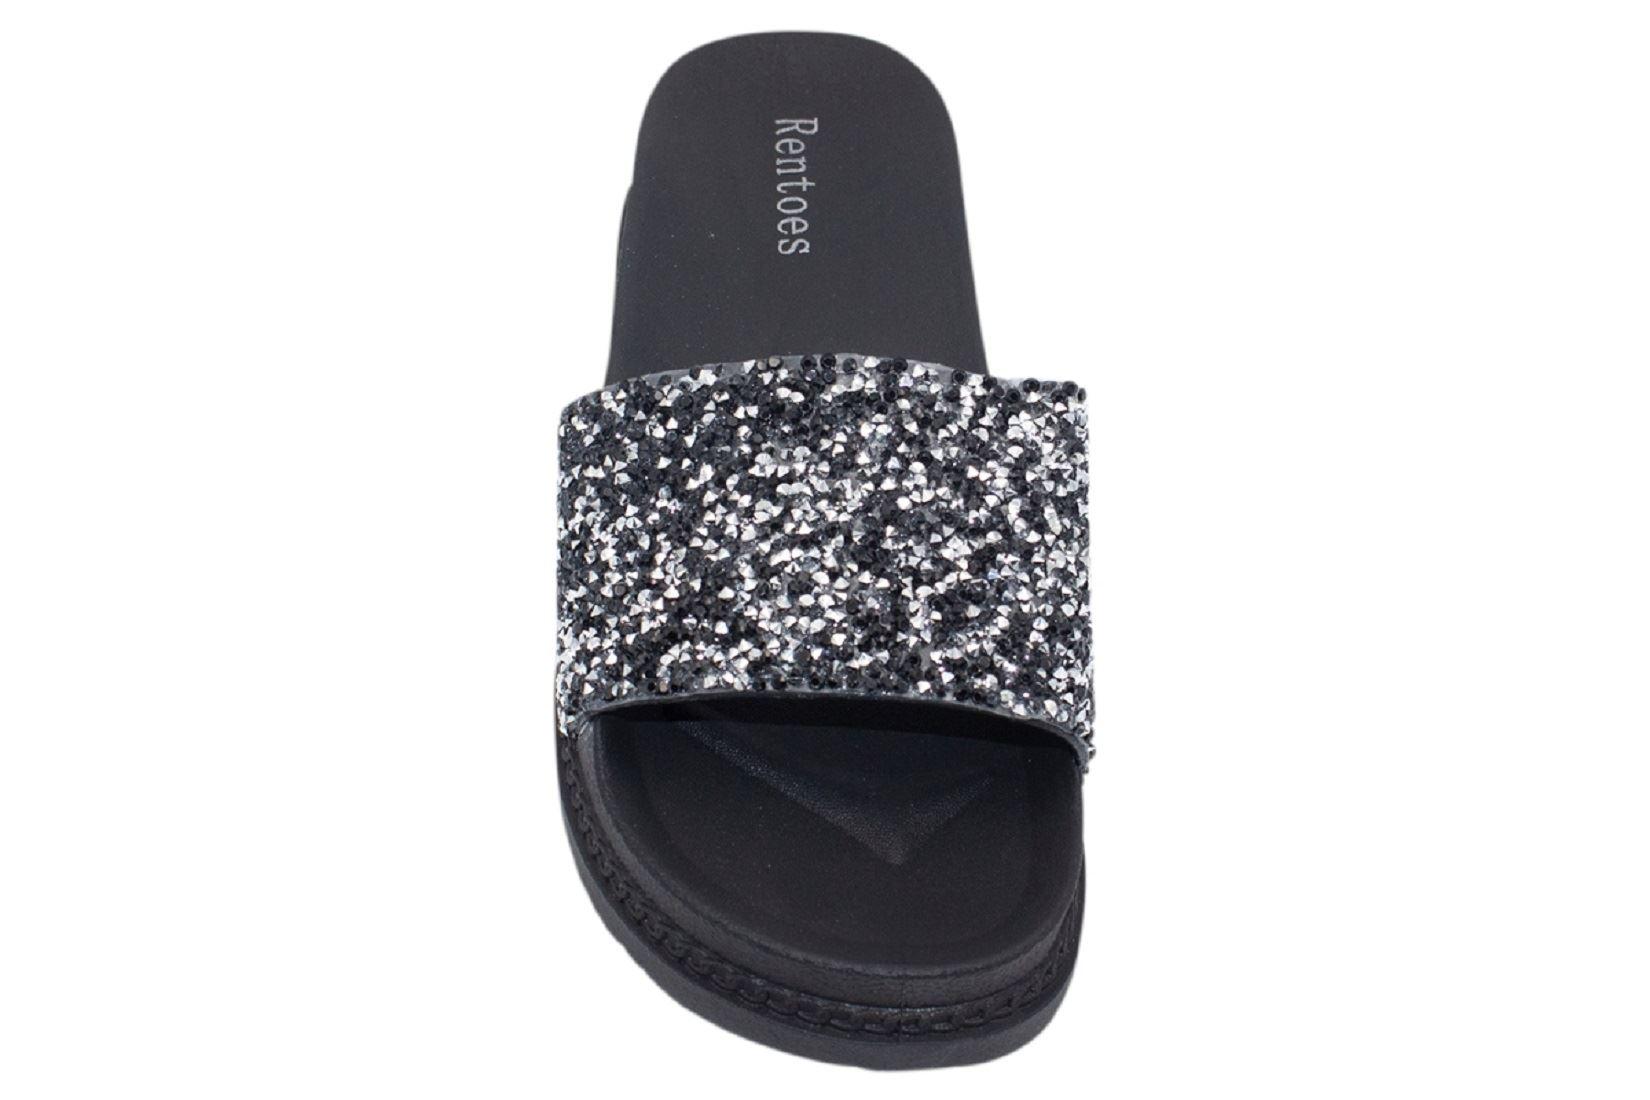 Womens-Sliders-Casual-Slippers-Mules-Ladies-Diamante-Flip-Flop-Sandals-Shoes thumbnail 63